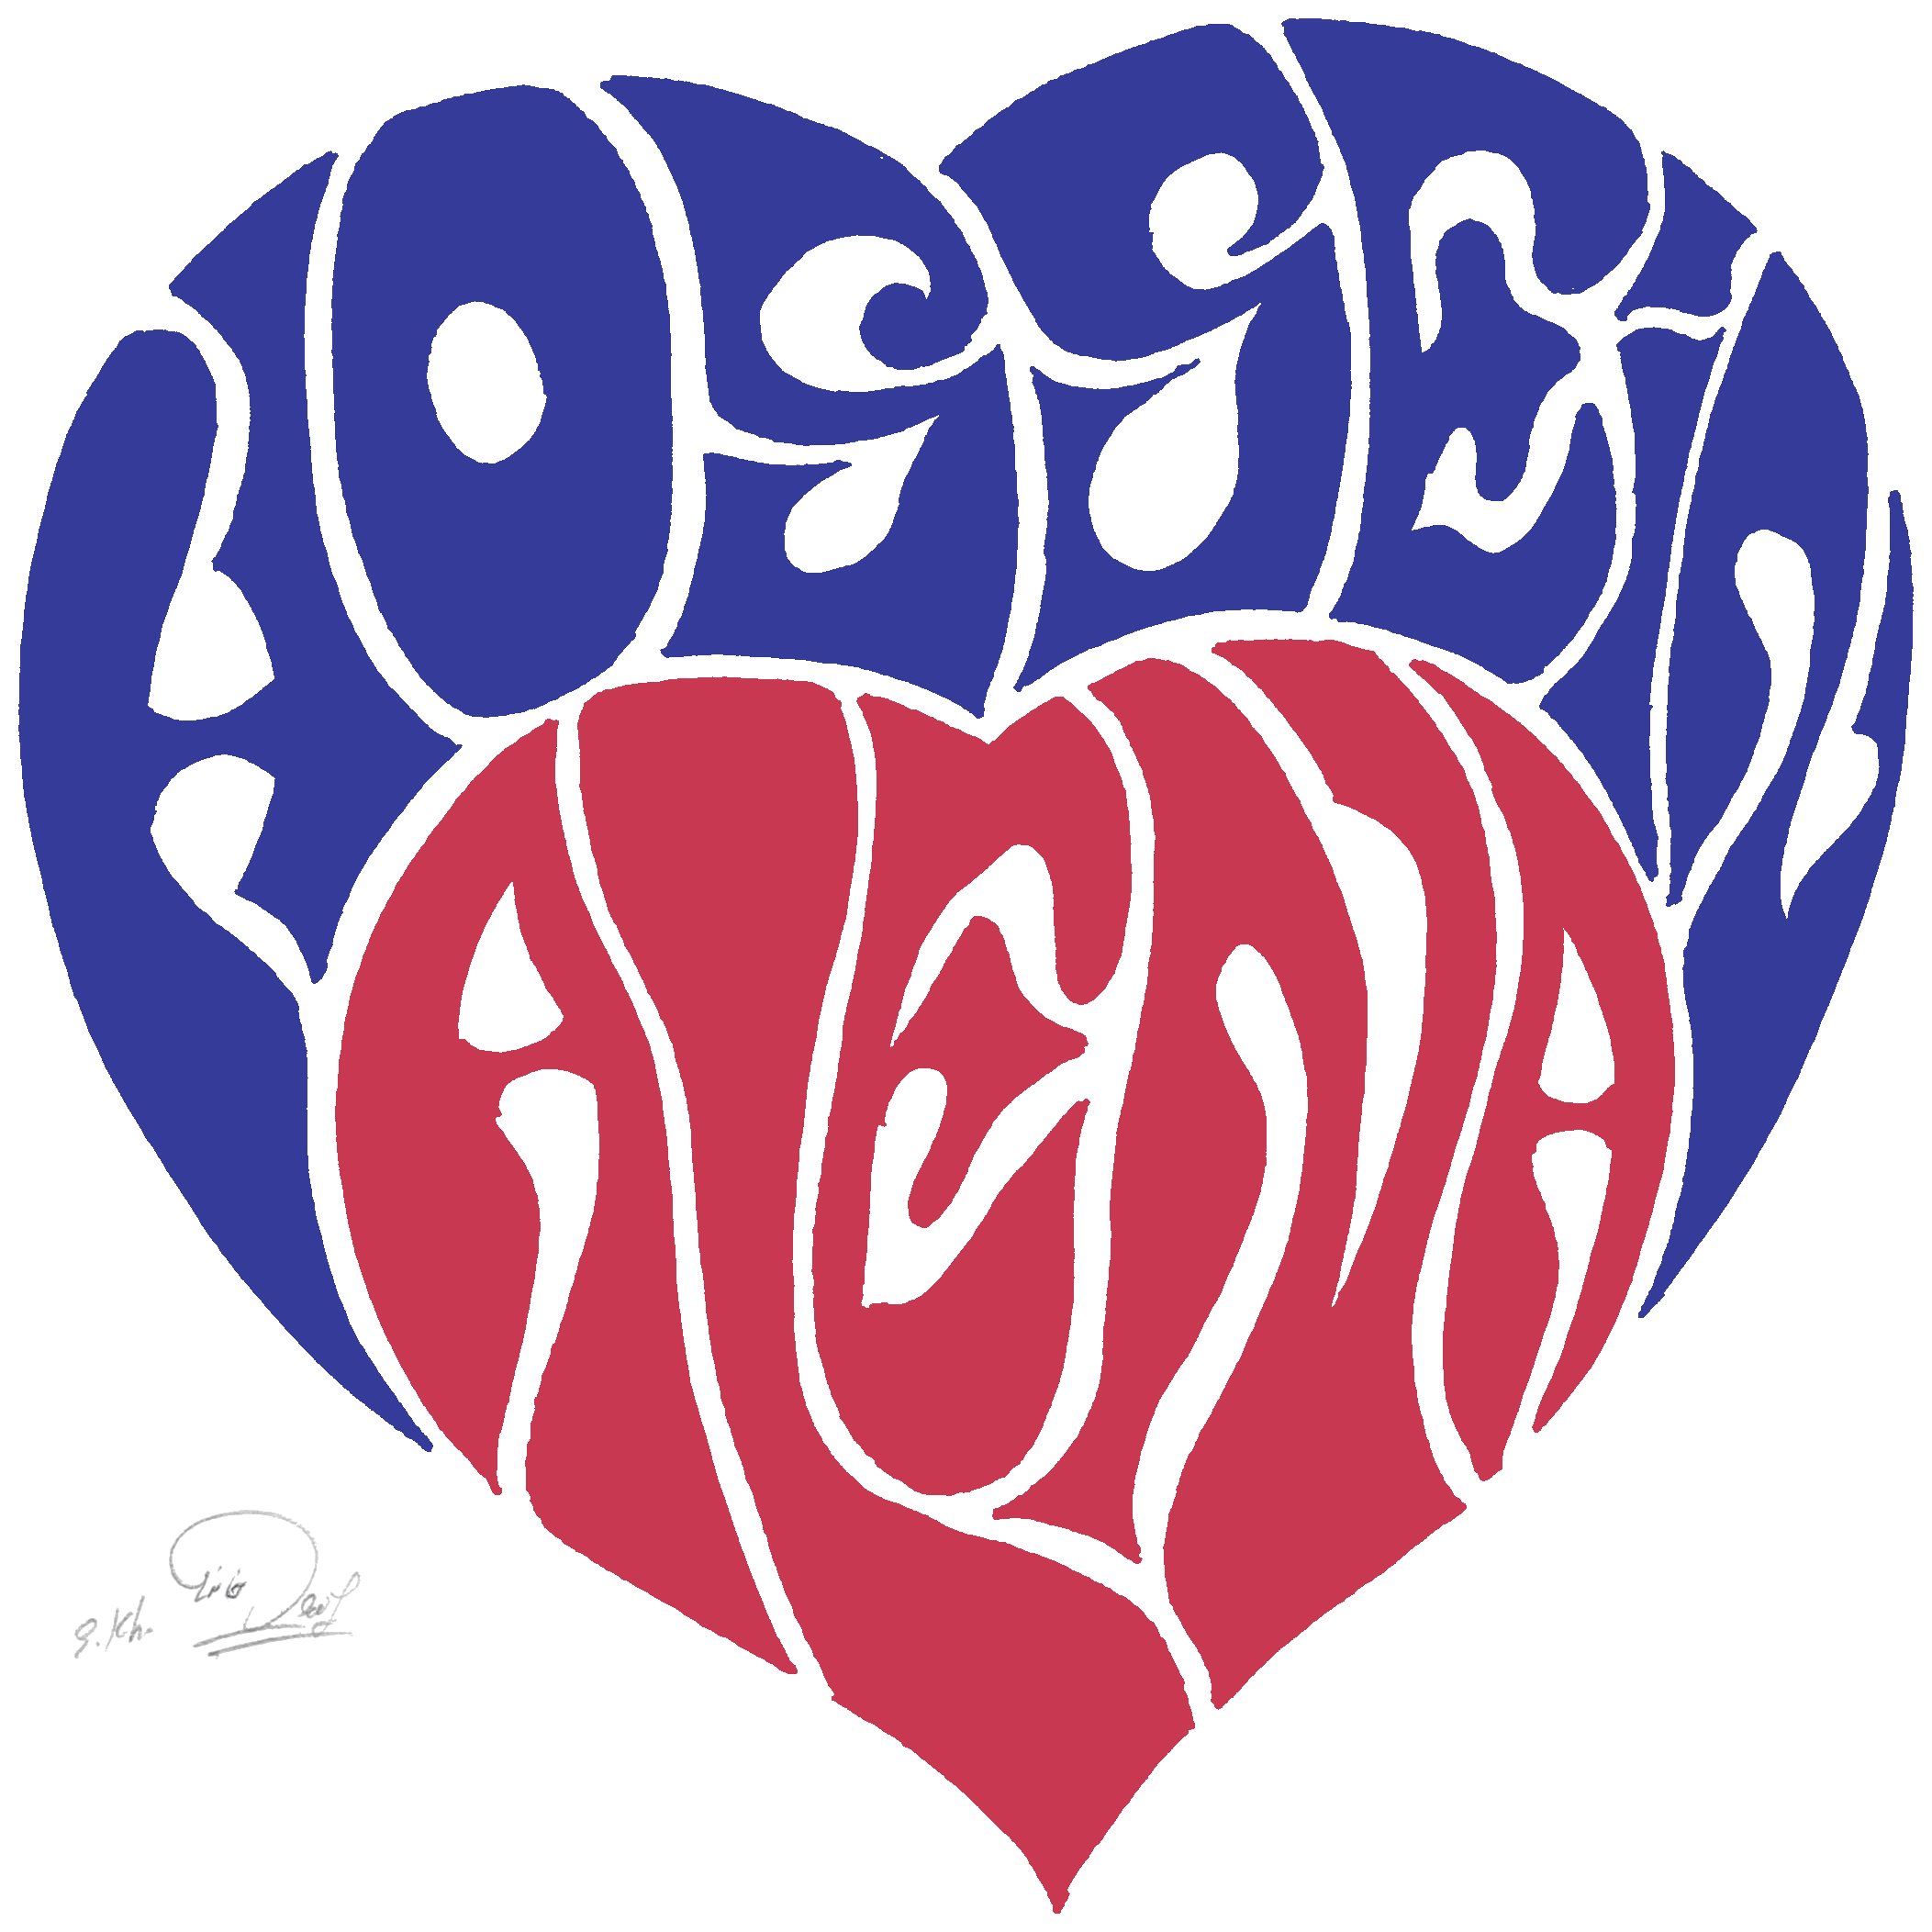 Hossein Alena Heart